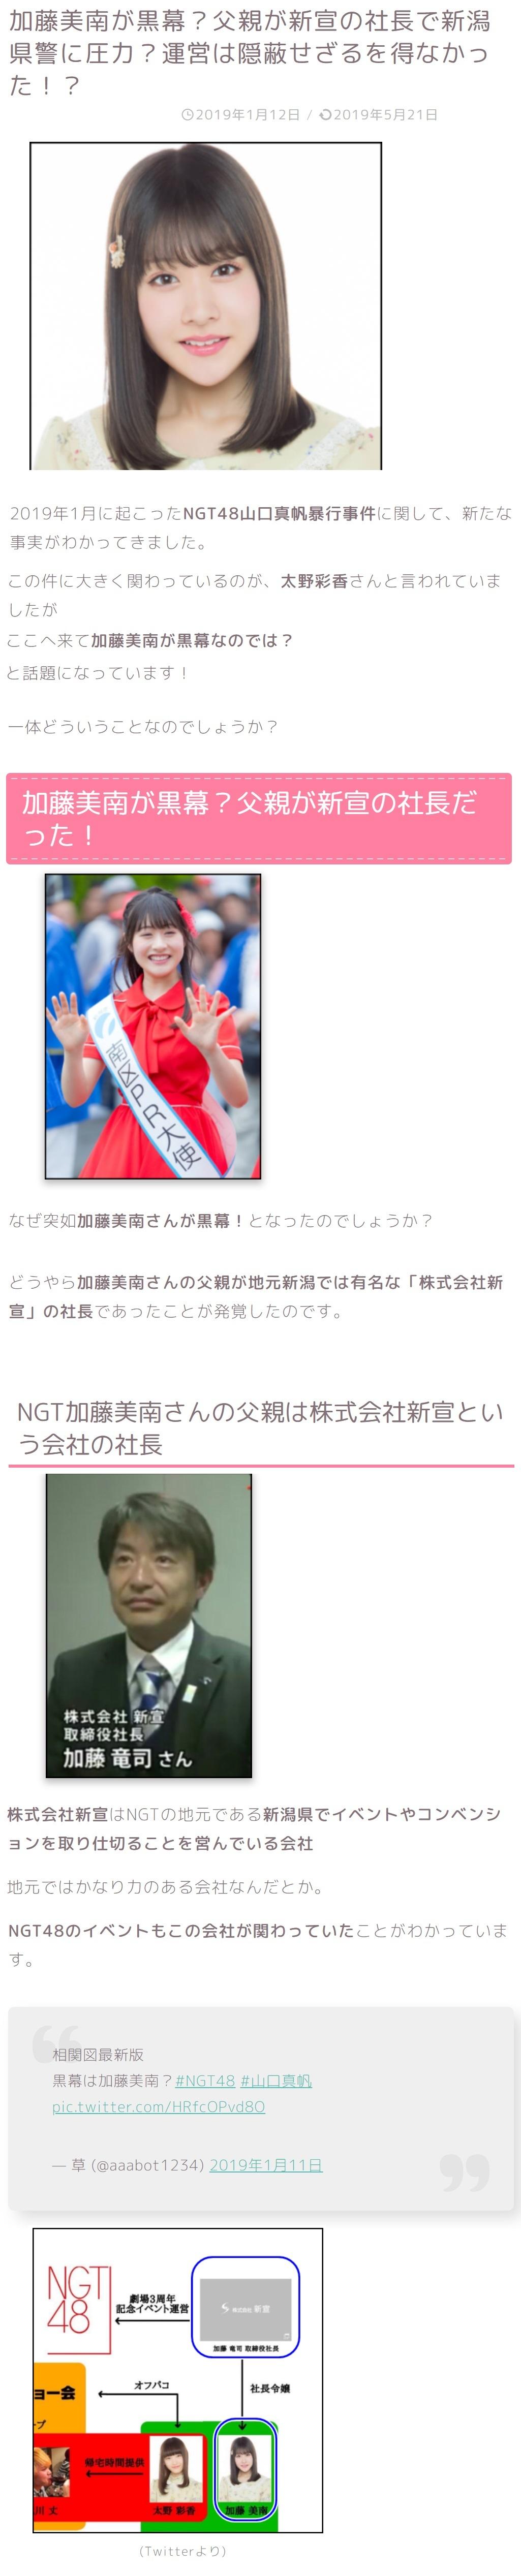 NGT山口真帆暴行事件5